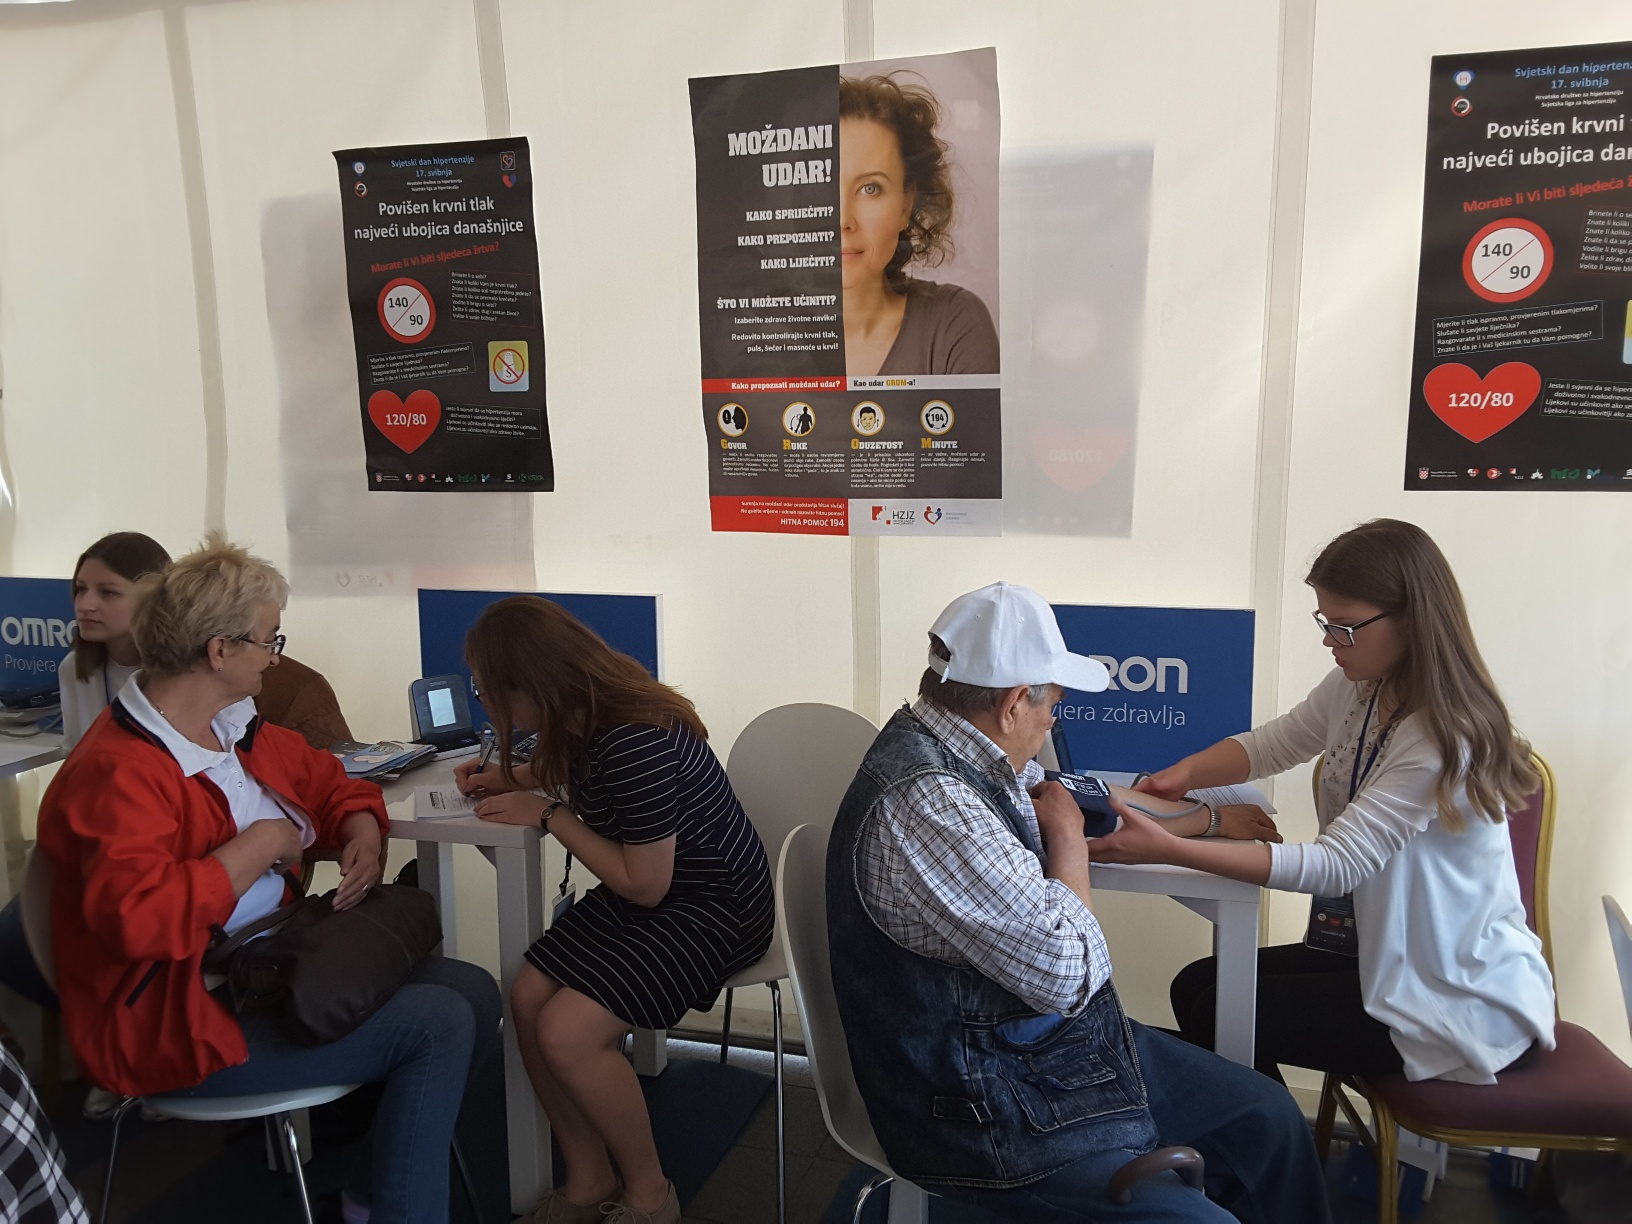 Saznajte koliki je Vaš krvni tlak | Hrvatski zavod za javno zdravstvo